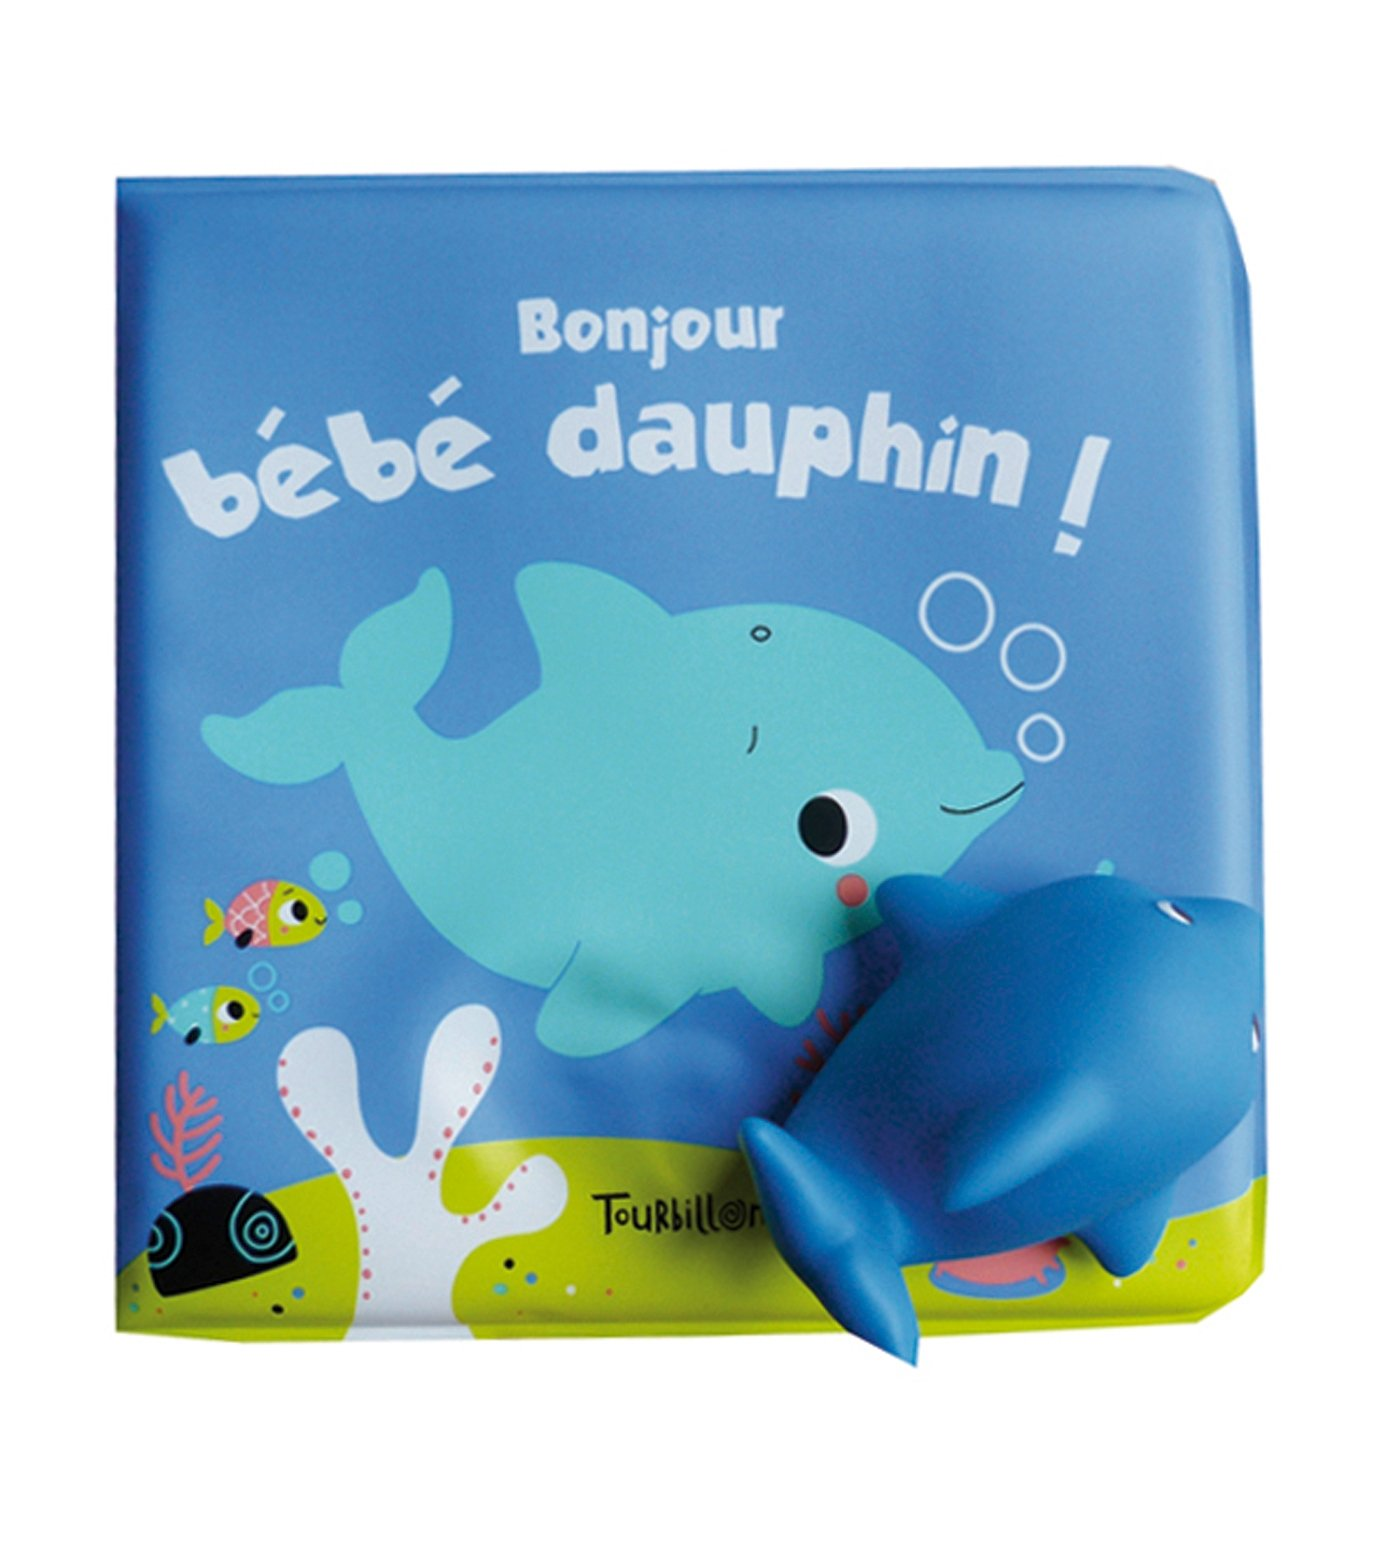 Bonjour Bebe Dauphin Tb Livres Bain French Edition